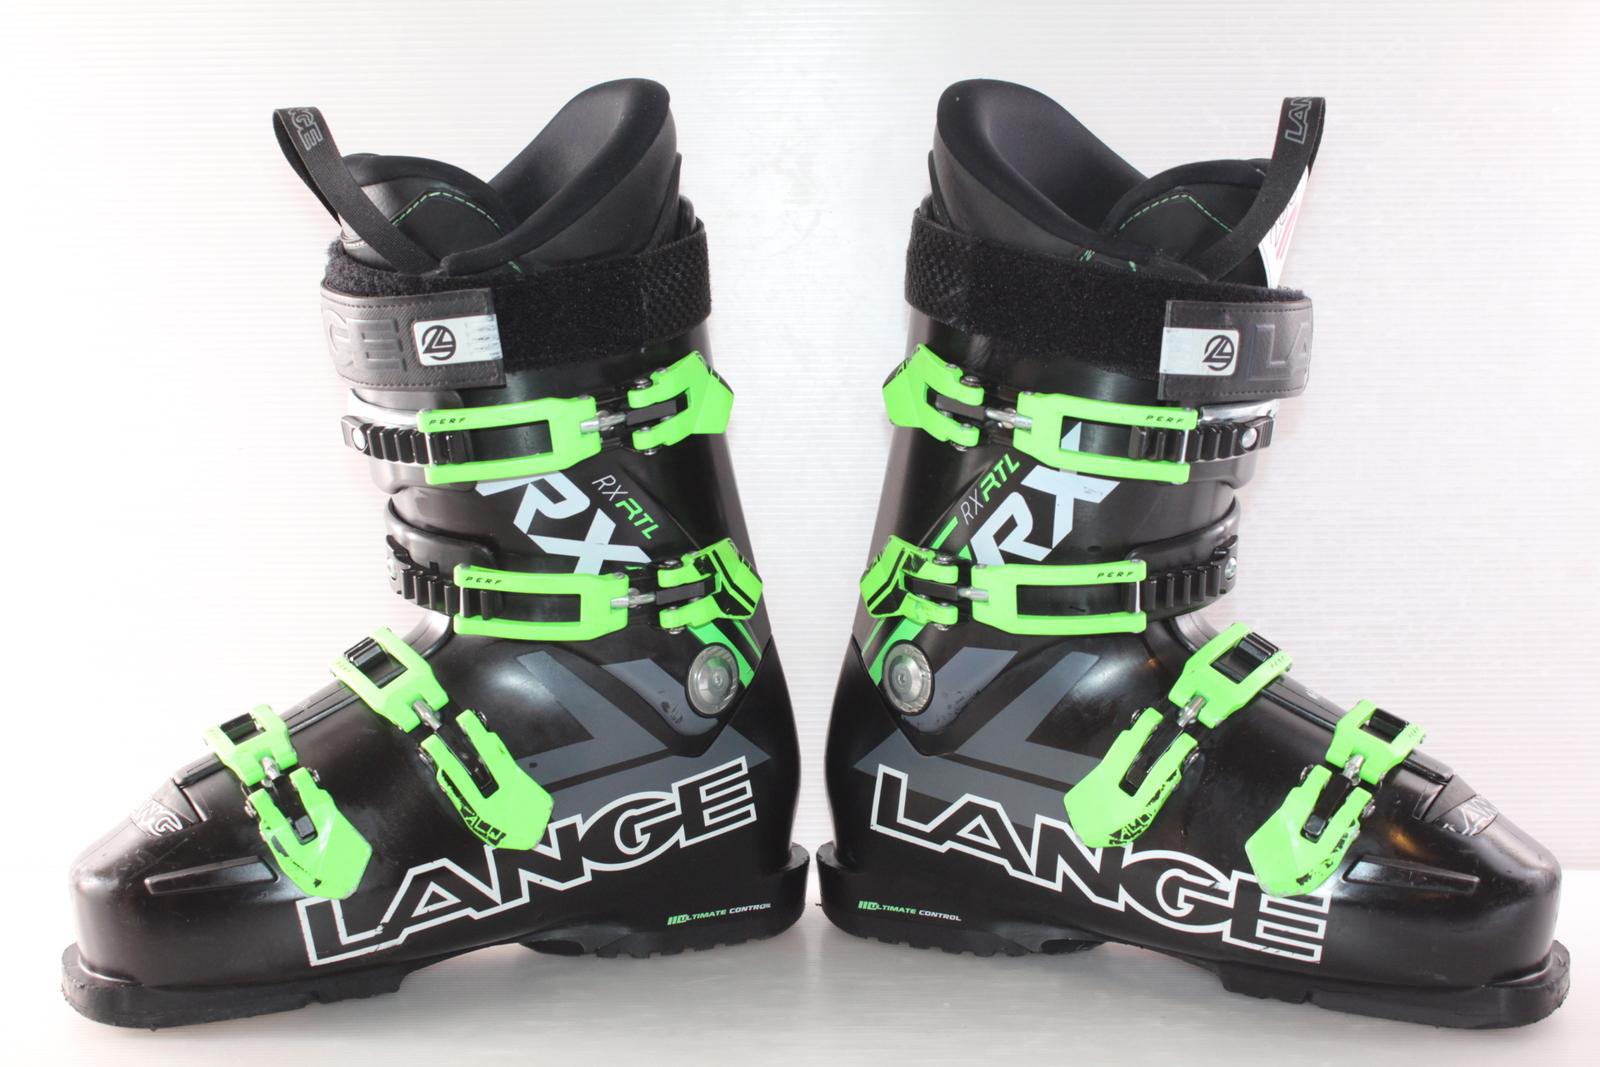 Lyžařské boty Lange RX RTL vel. EU40.5 flexe 85